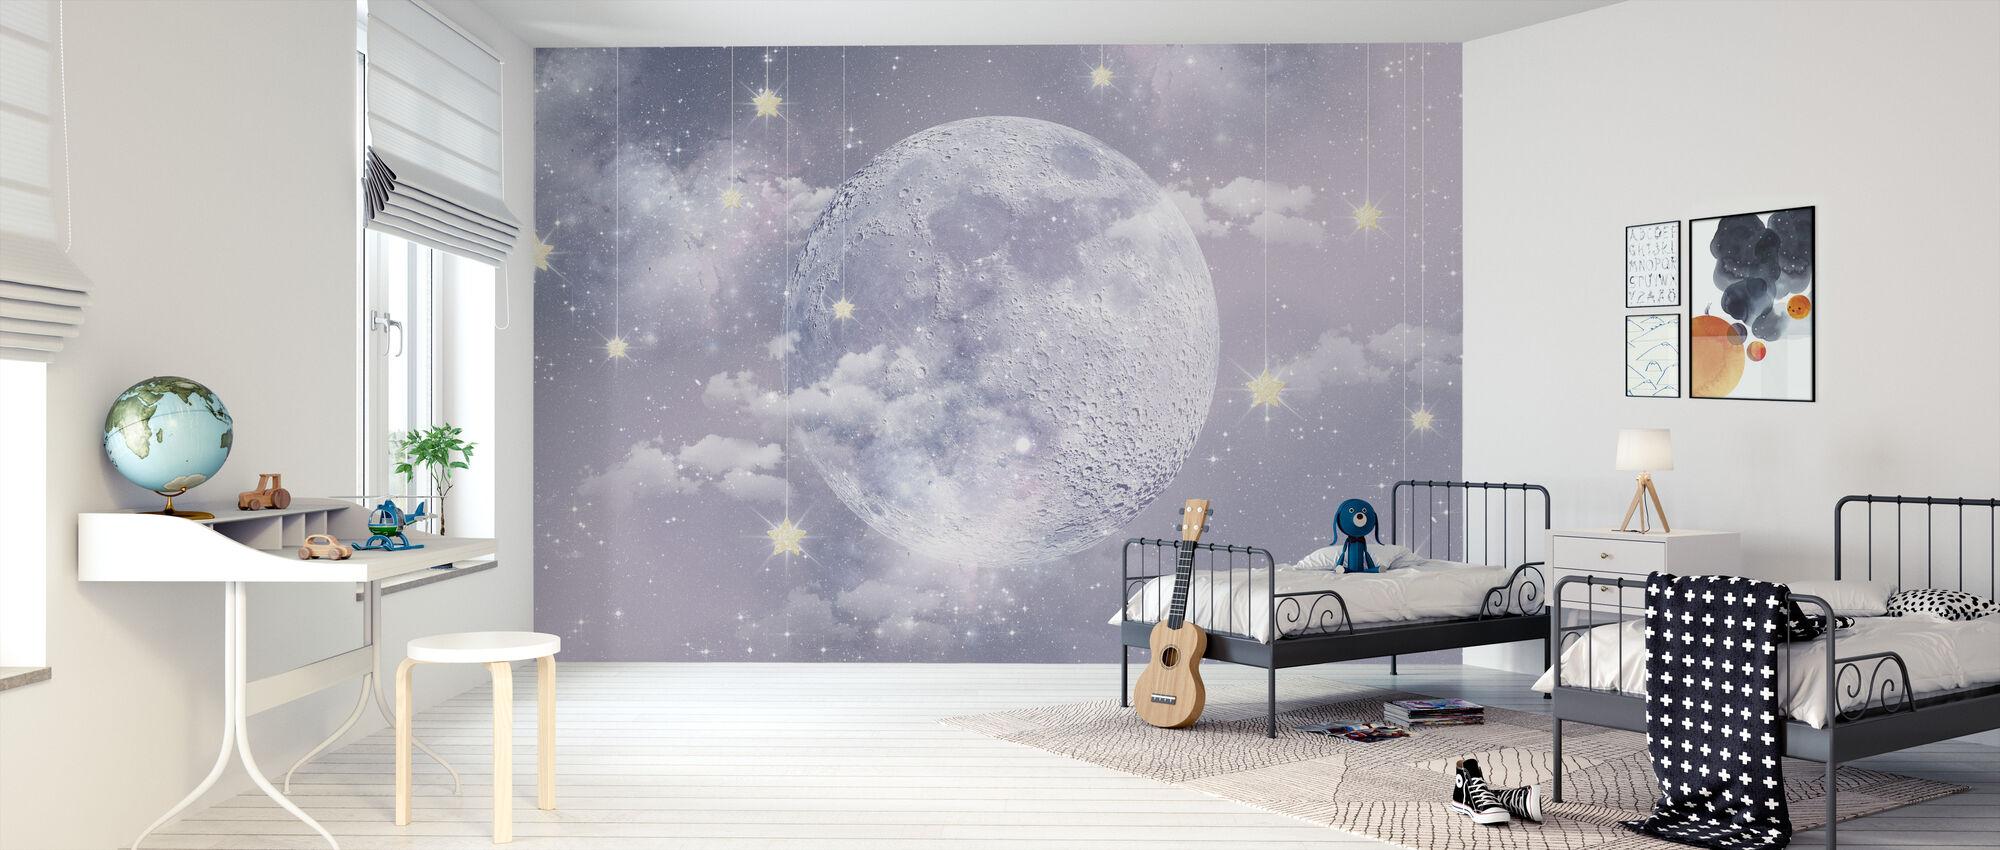 Månen med stjerner - Tapet - Barnerom